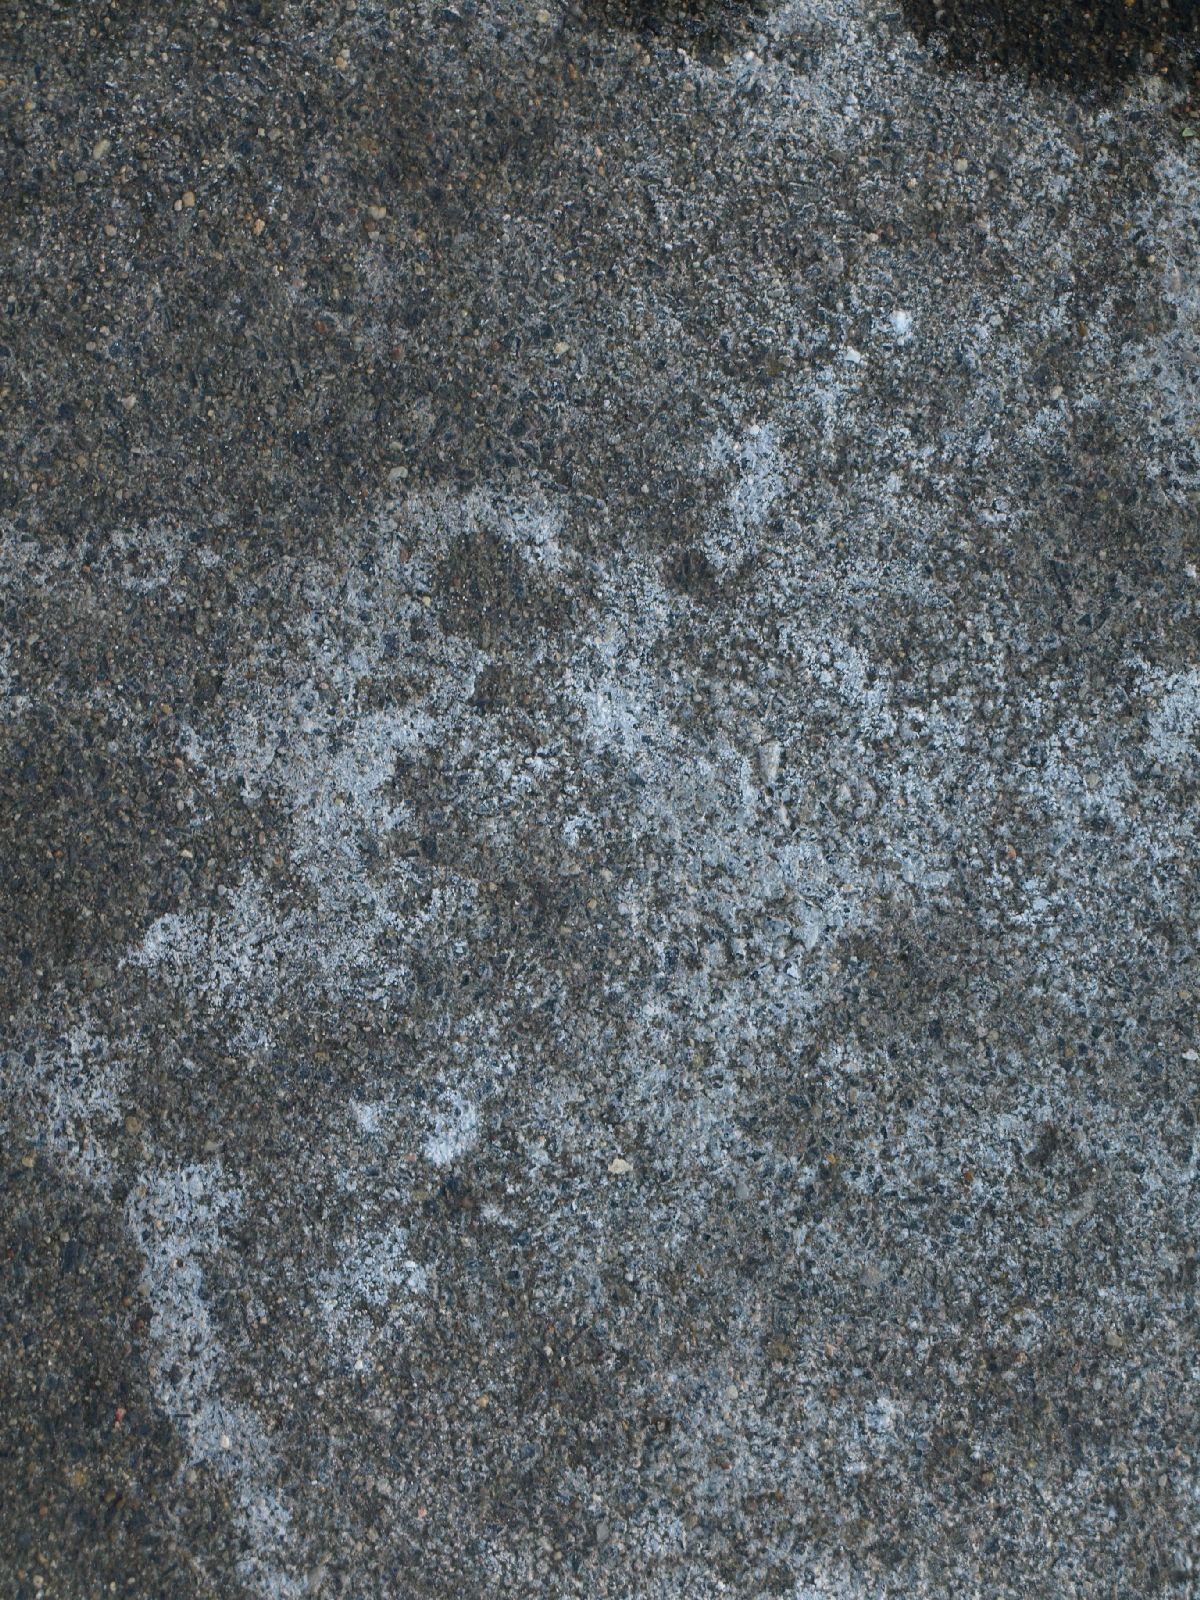 Snow_Texture_A_P1109051